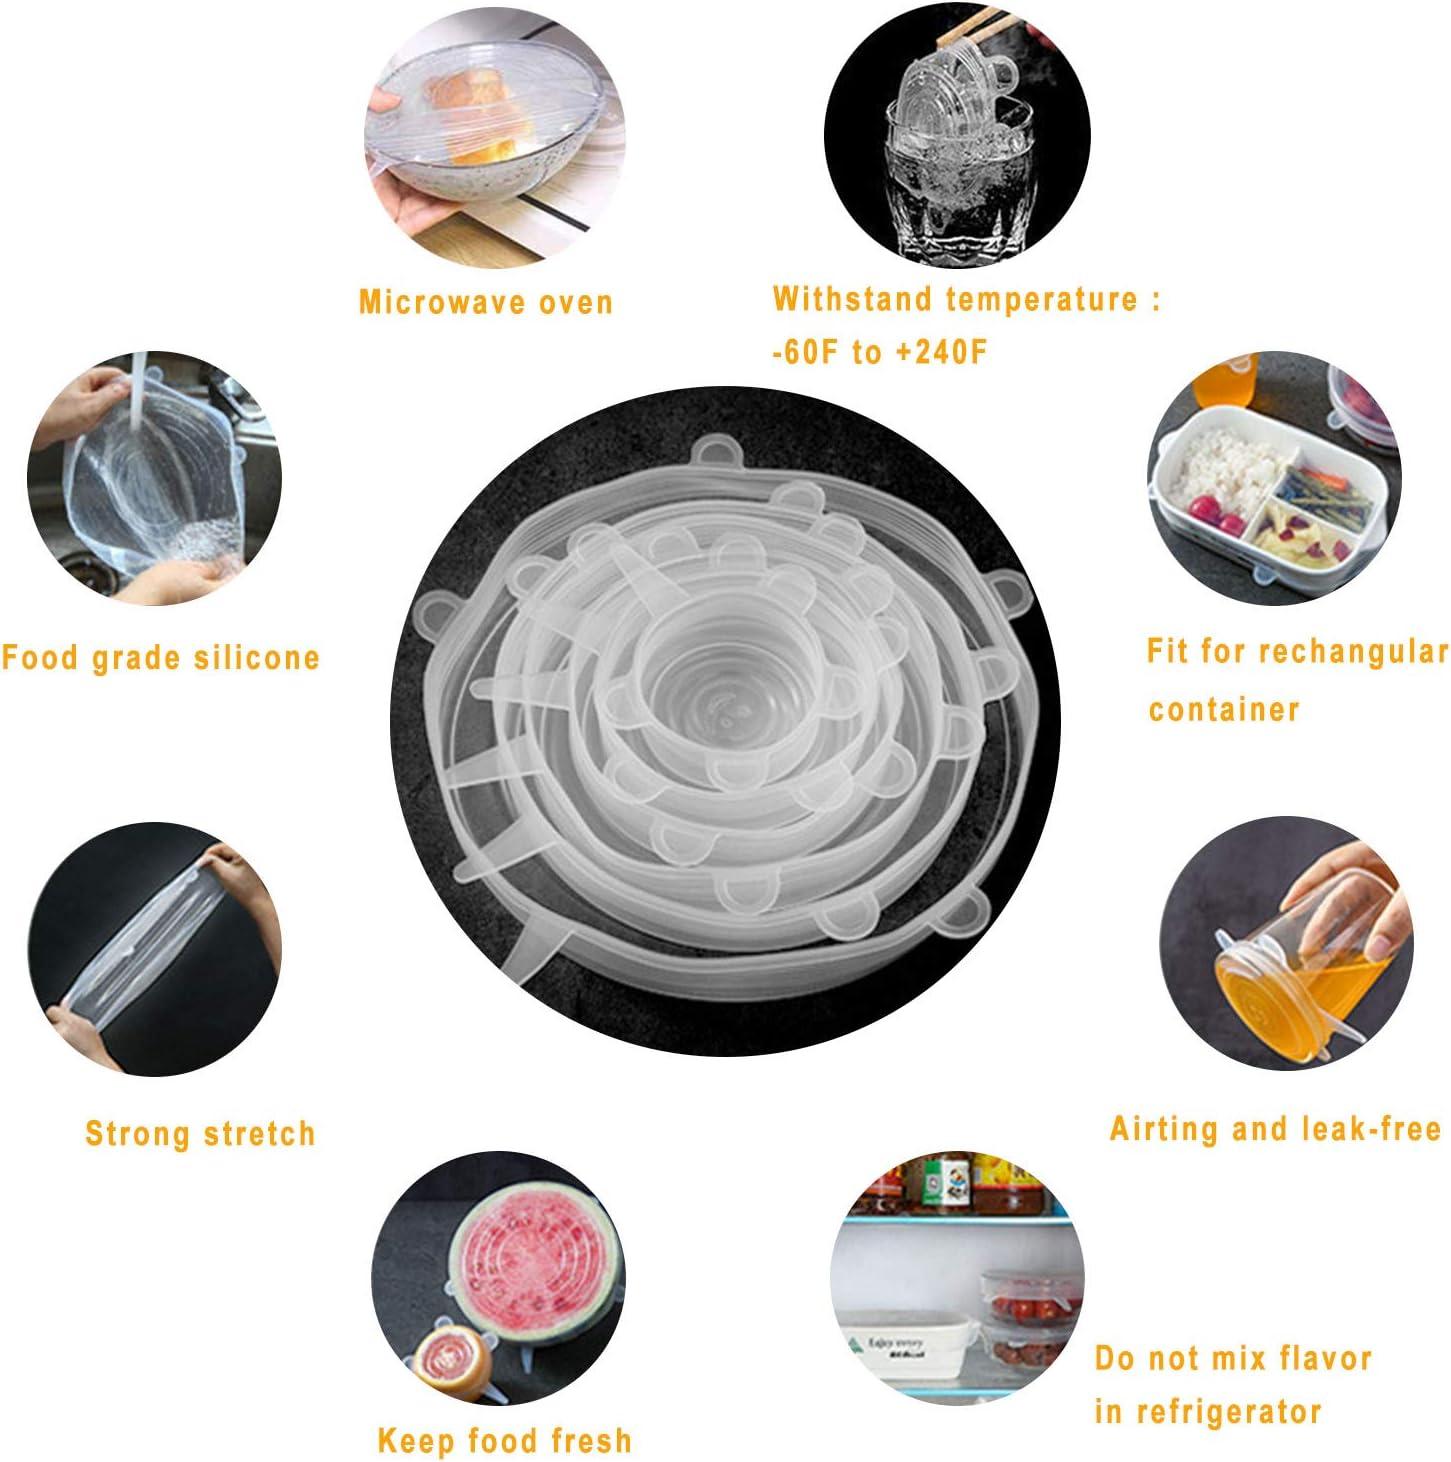 Tapas de Silicona El/ásticas Lavavajillas Reutilizable Fundas para Alimentos Tapa Tazas 12 Tapas Silicona Ajustables Cocina Refrigerador Boles o Tarros